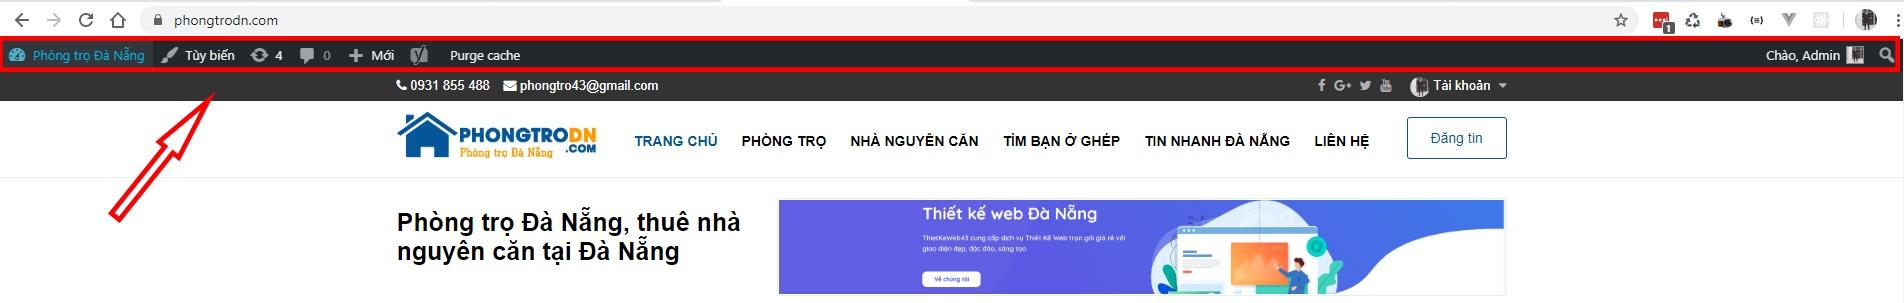 Hiển thị admin bar trong wordpress